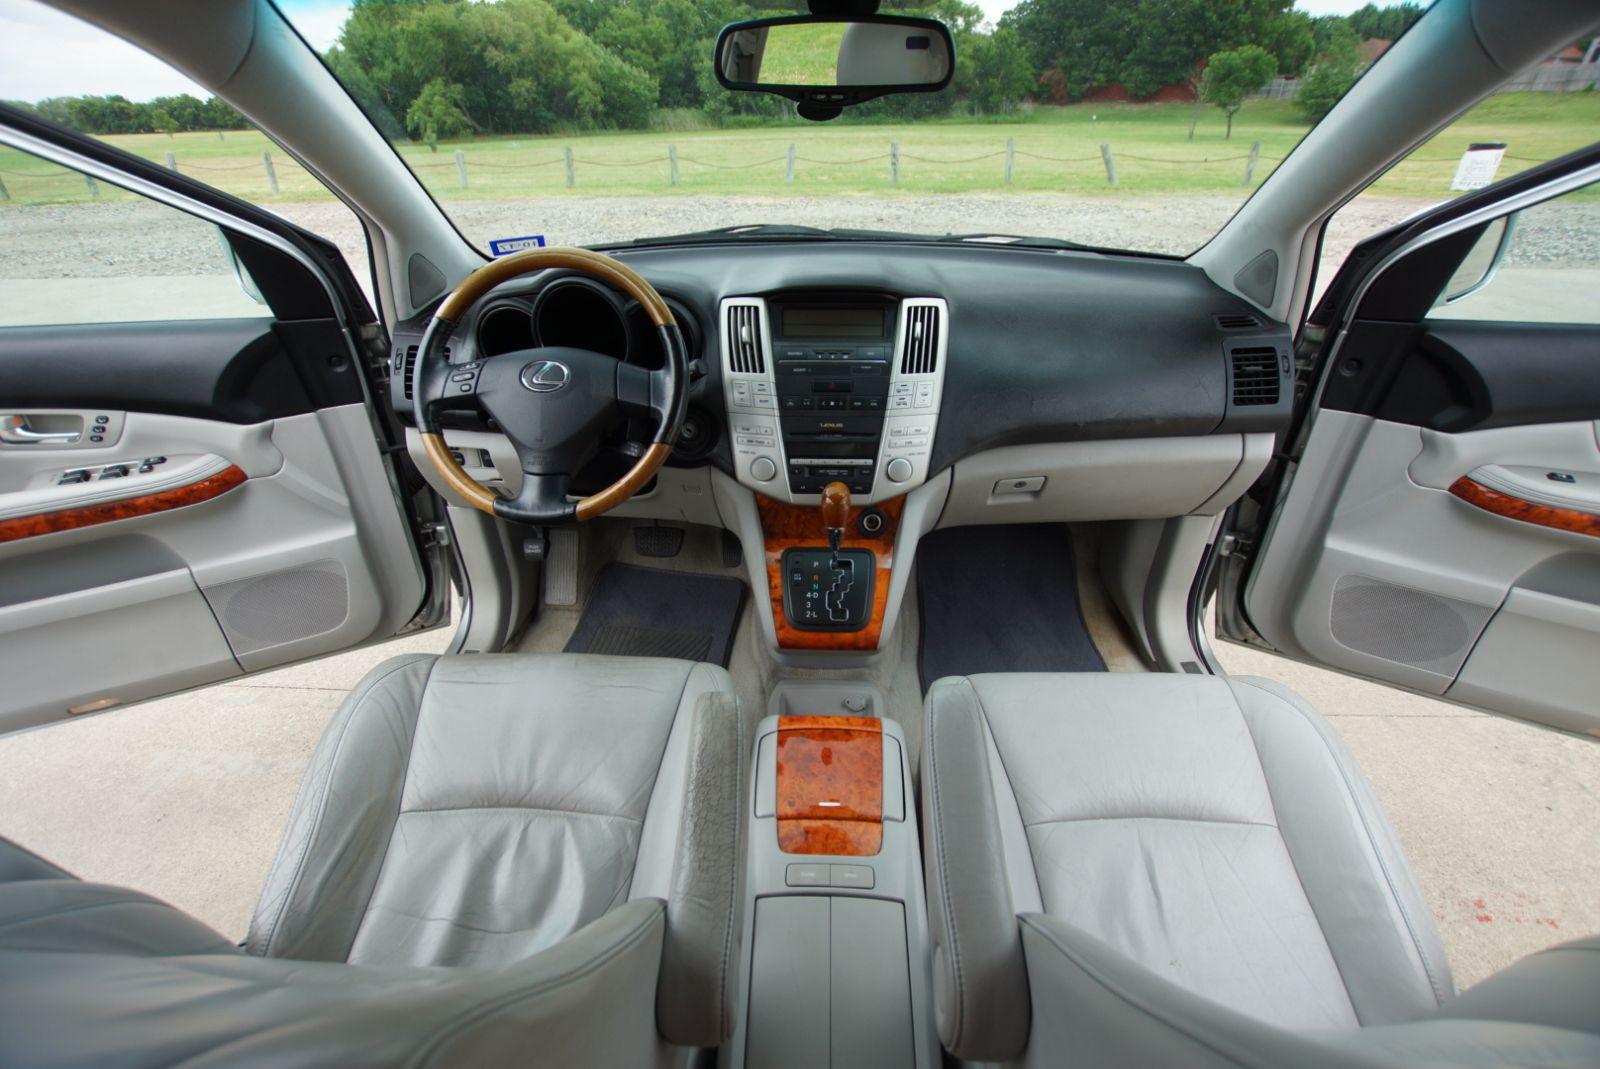 2005 Lexus Rx 330 Very Nice Rowlett Texas 75088 Rx330 Interior In